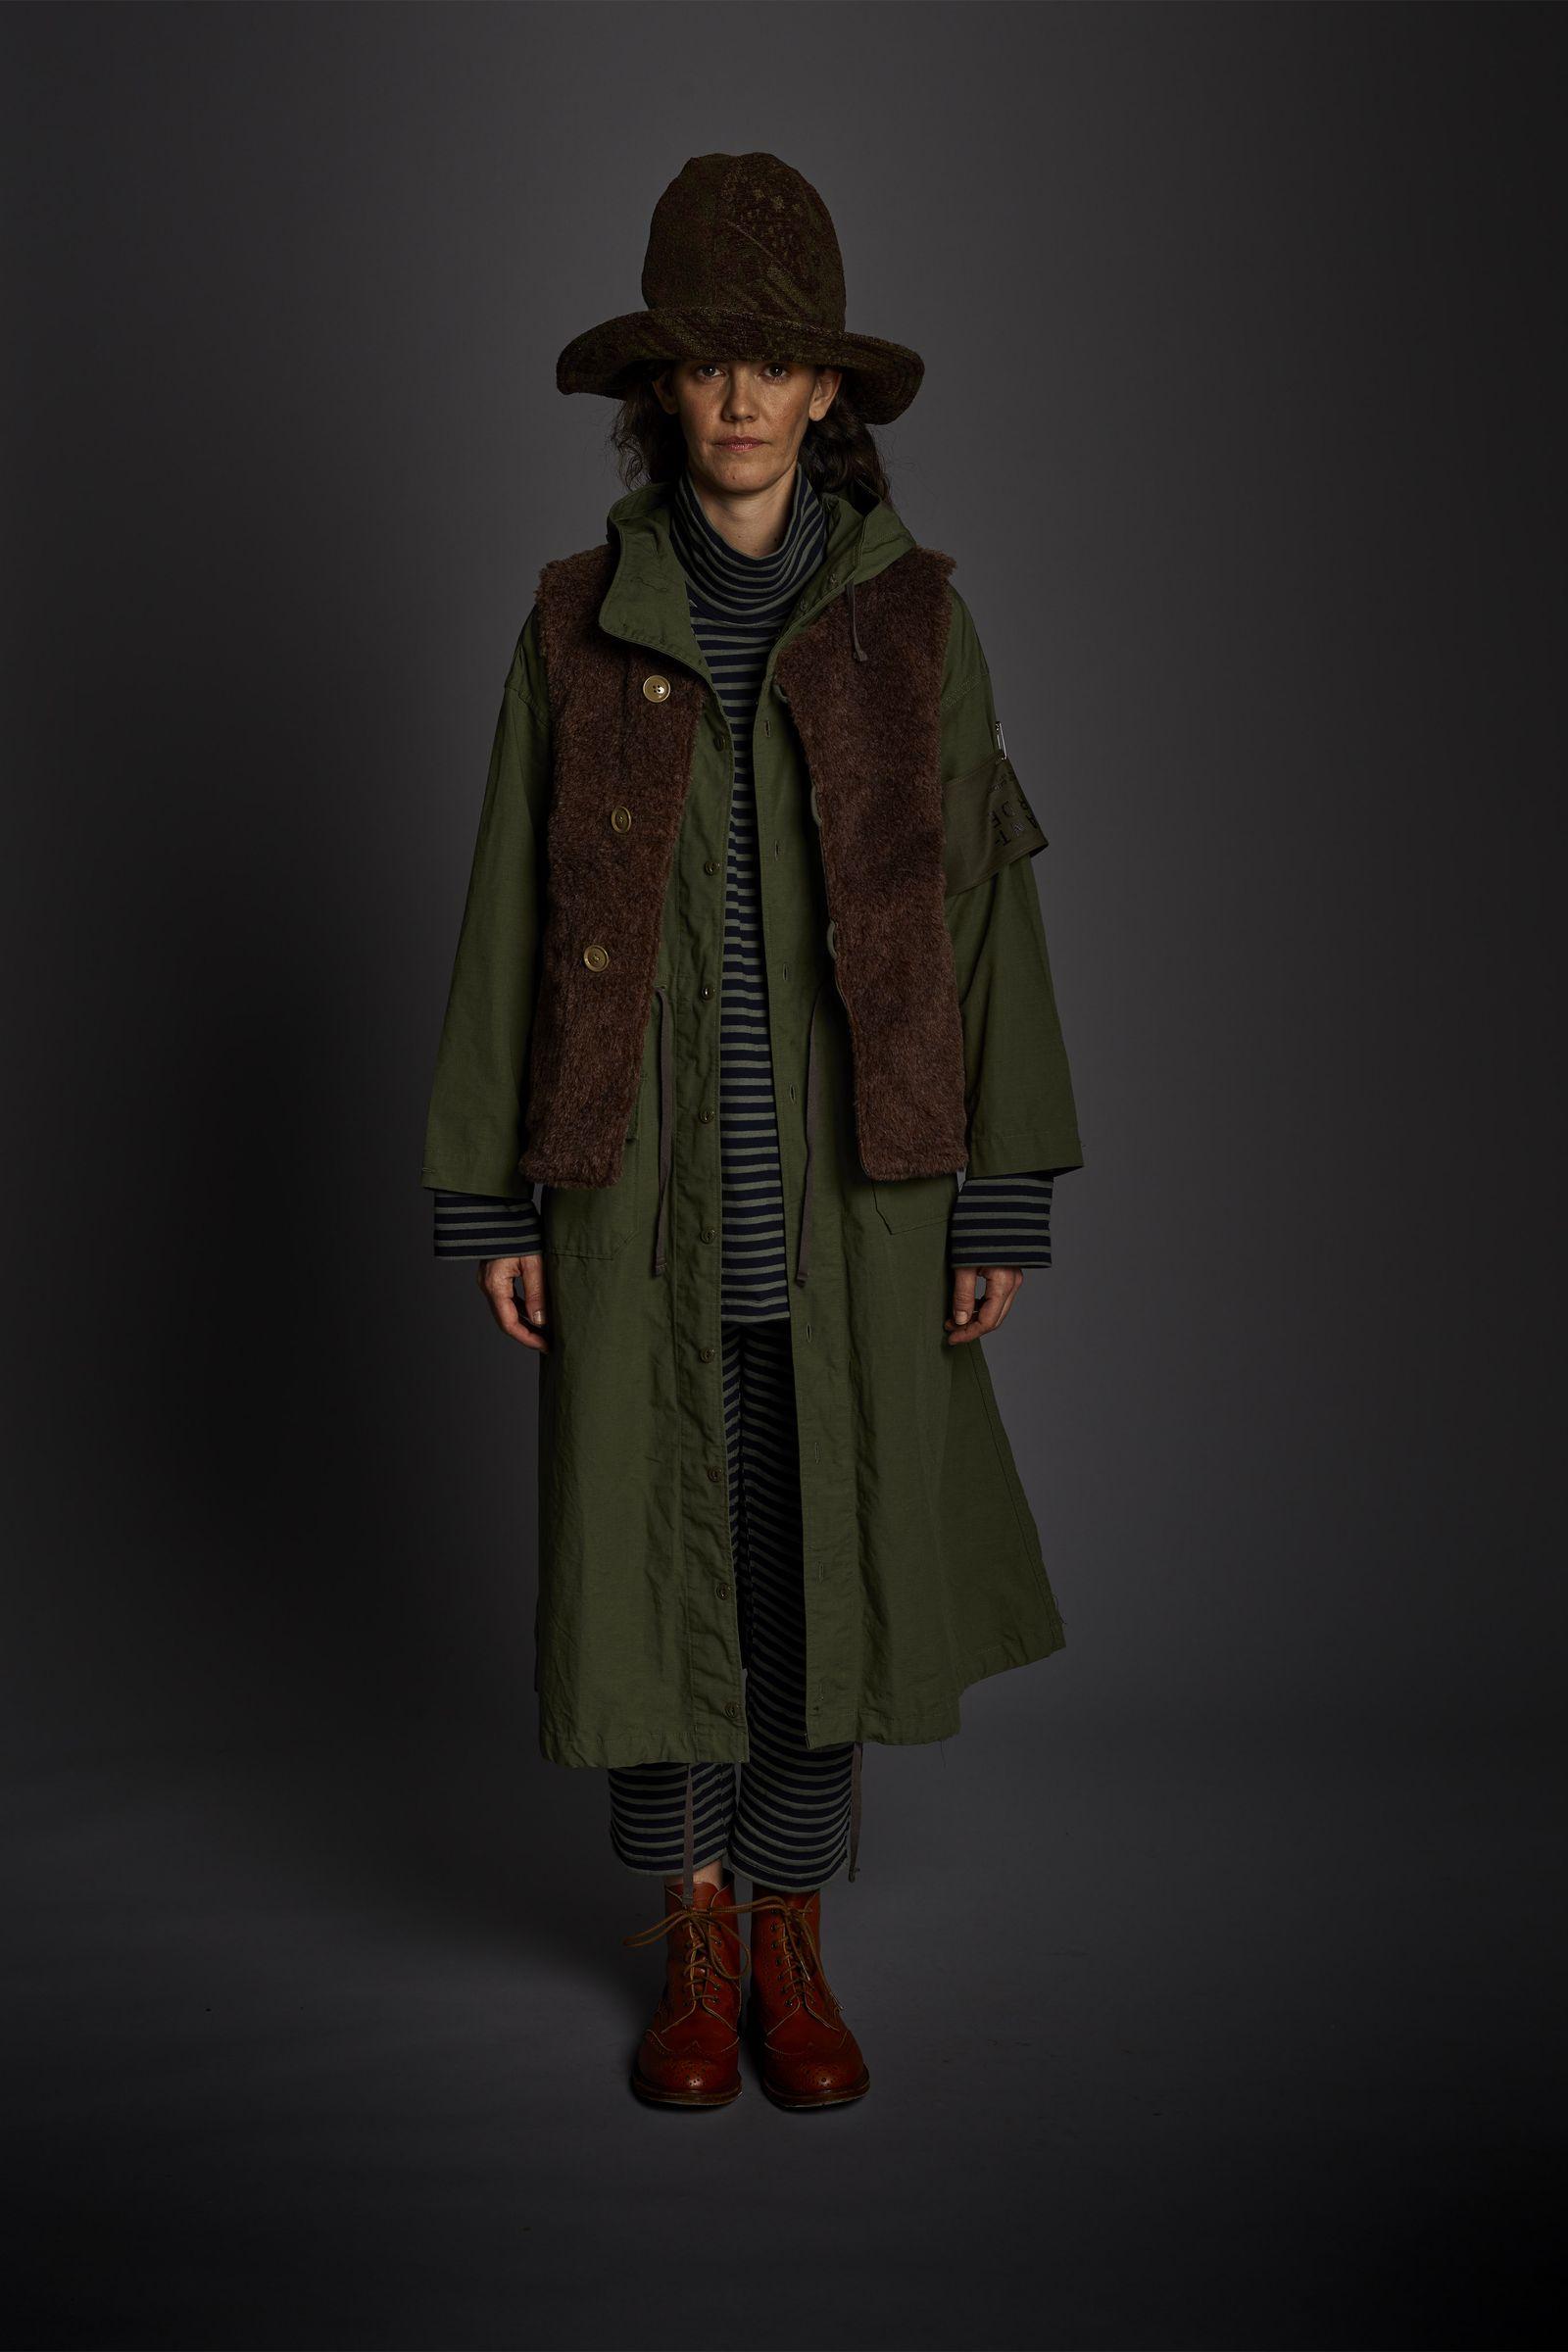 engineered-garments-fall-winter-2020-05